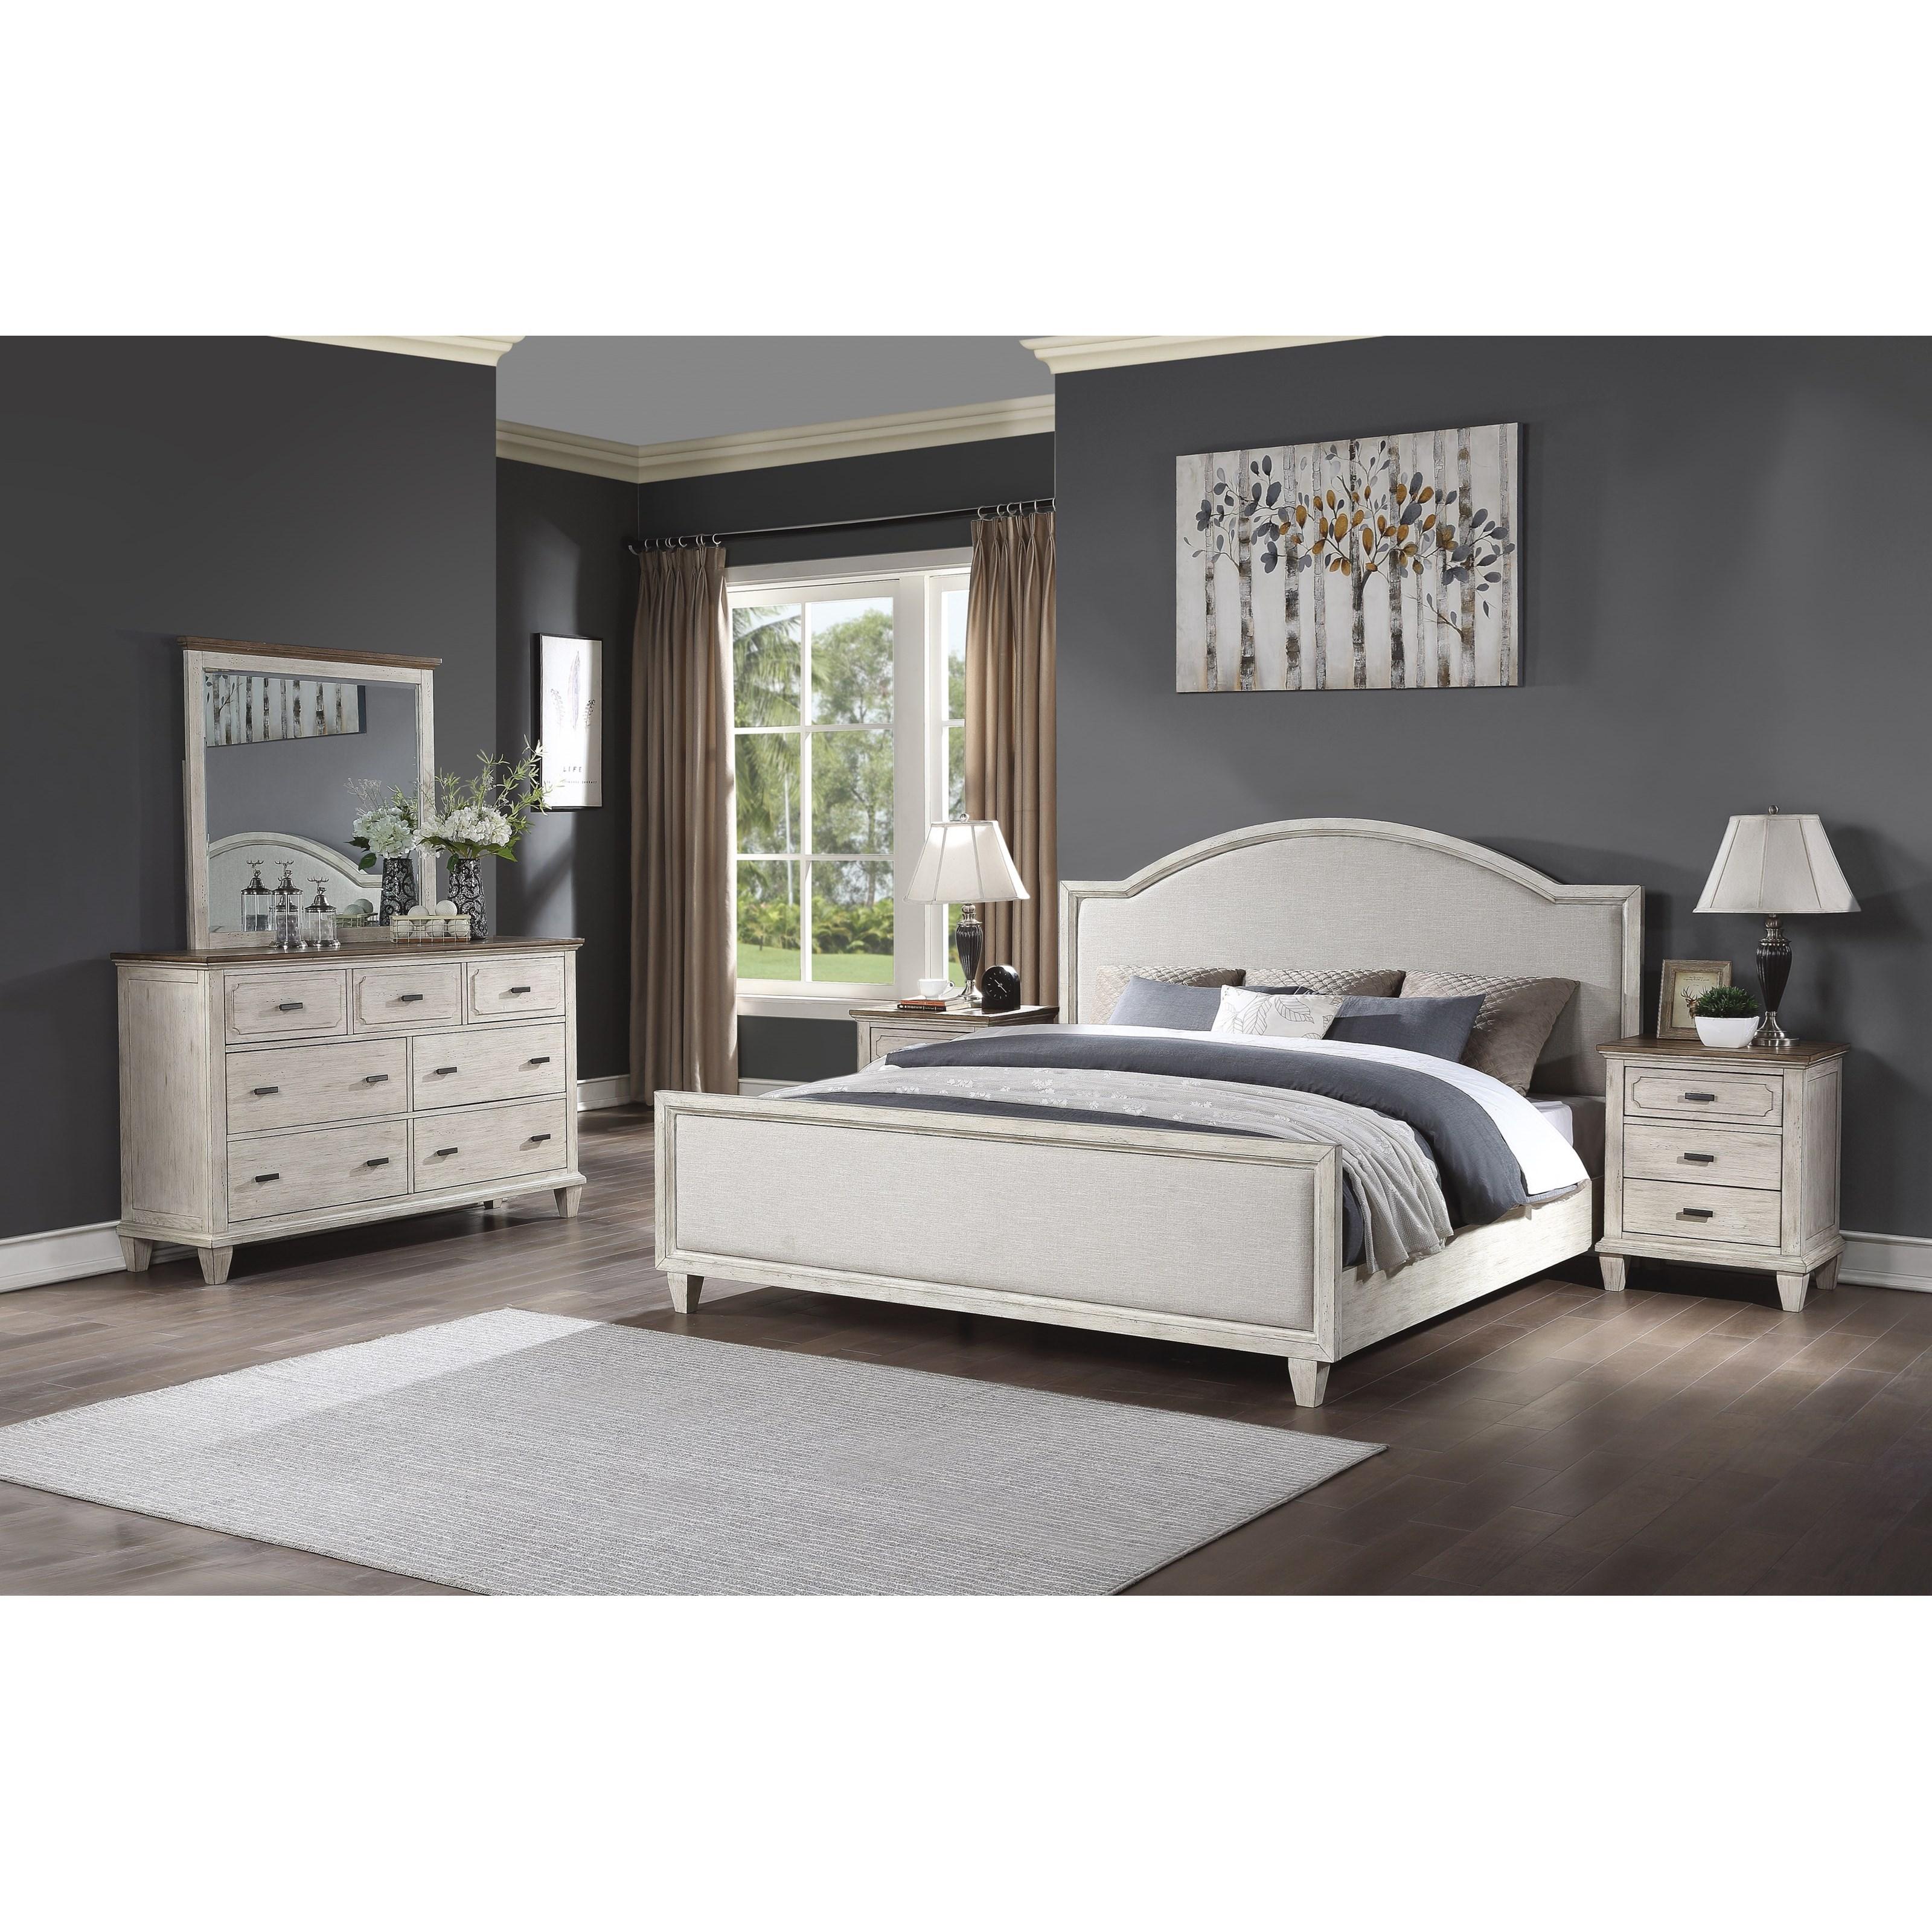 Newport Queen Bedroom Group by Flexsteel Wynwood Collection at Northeast Factory Direct